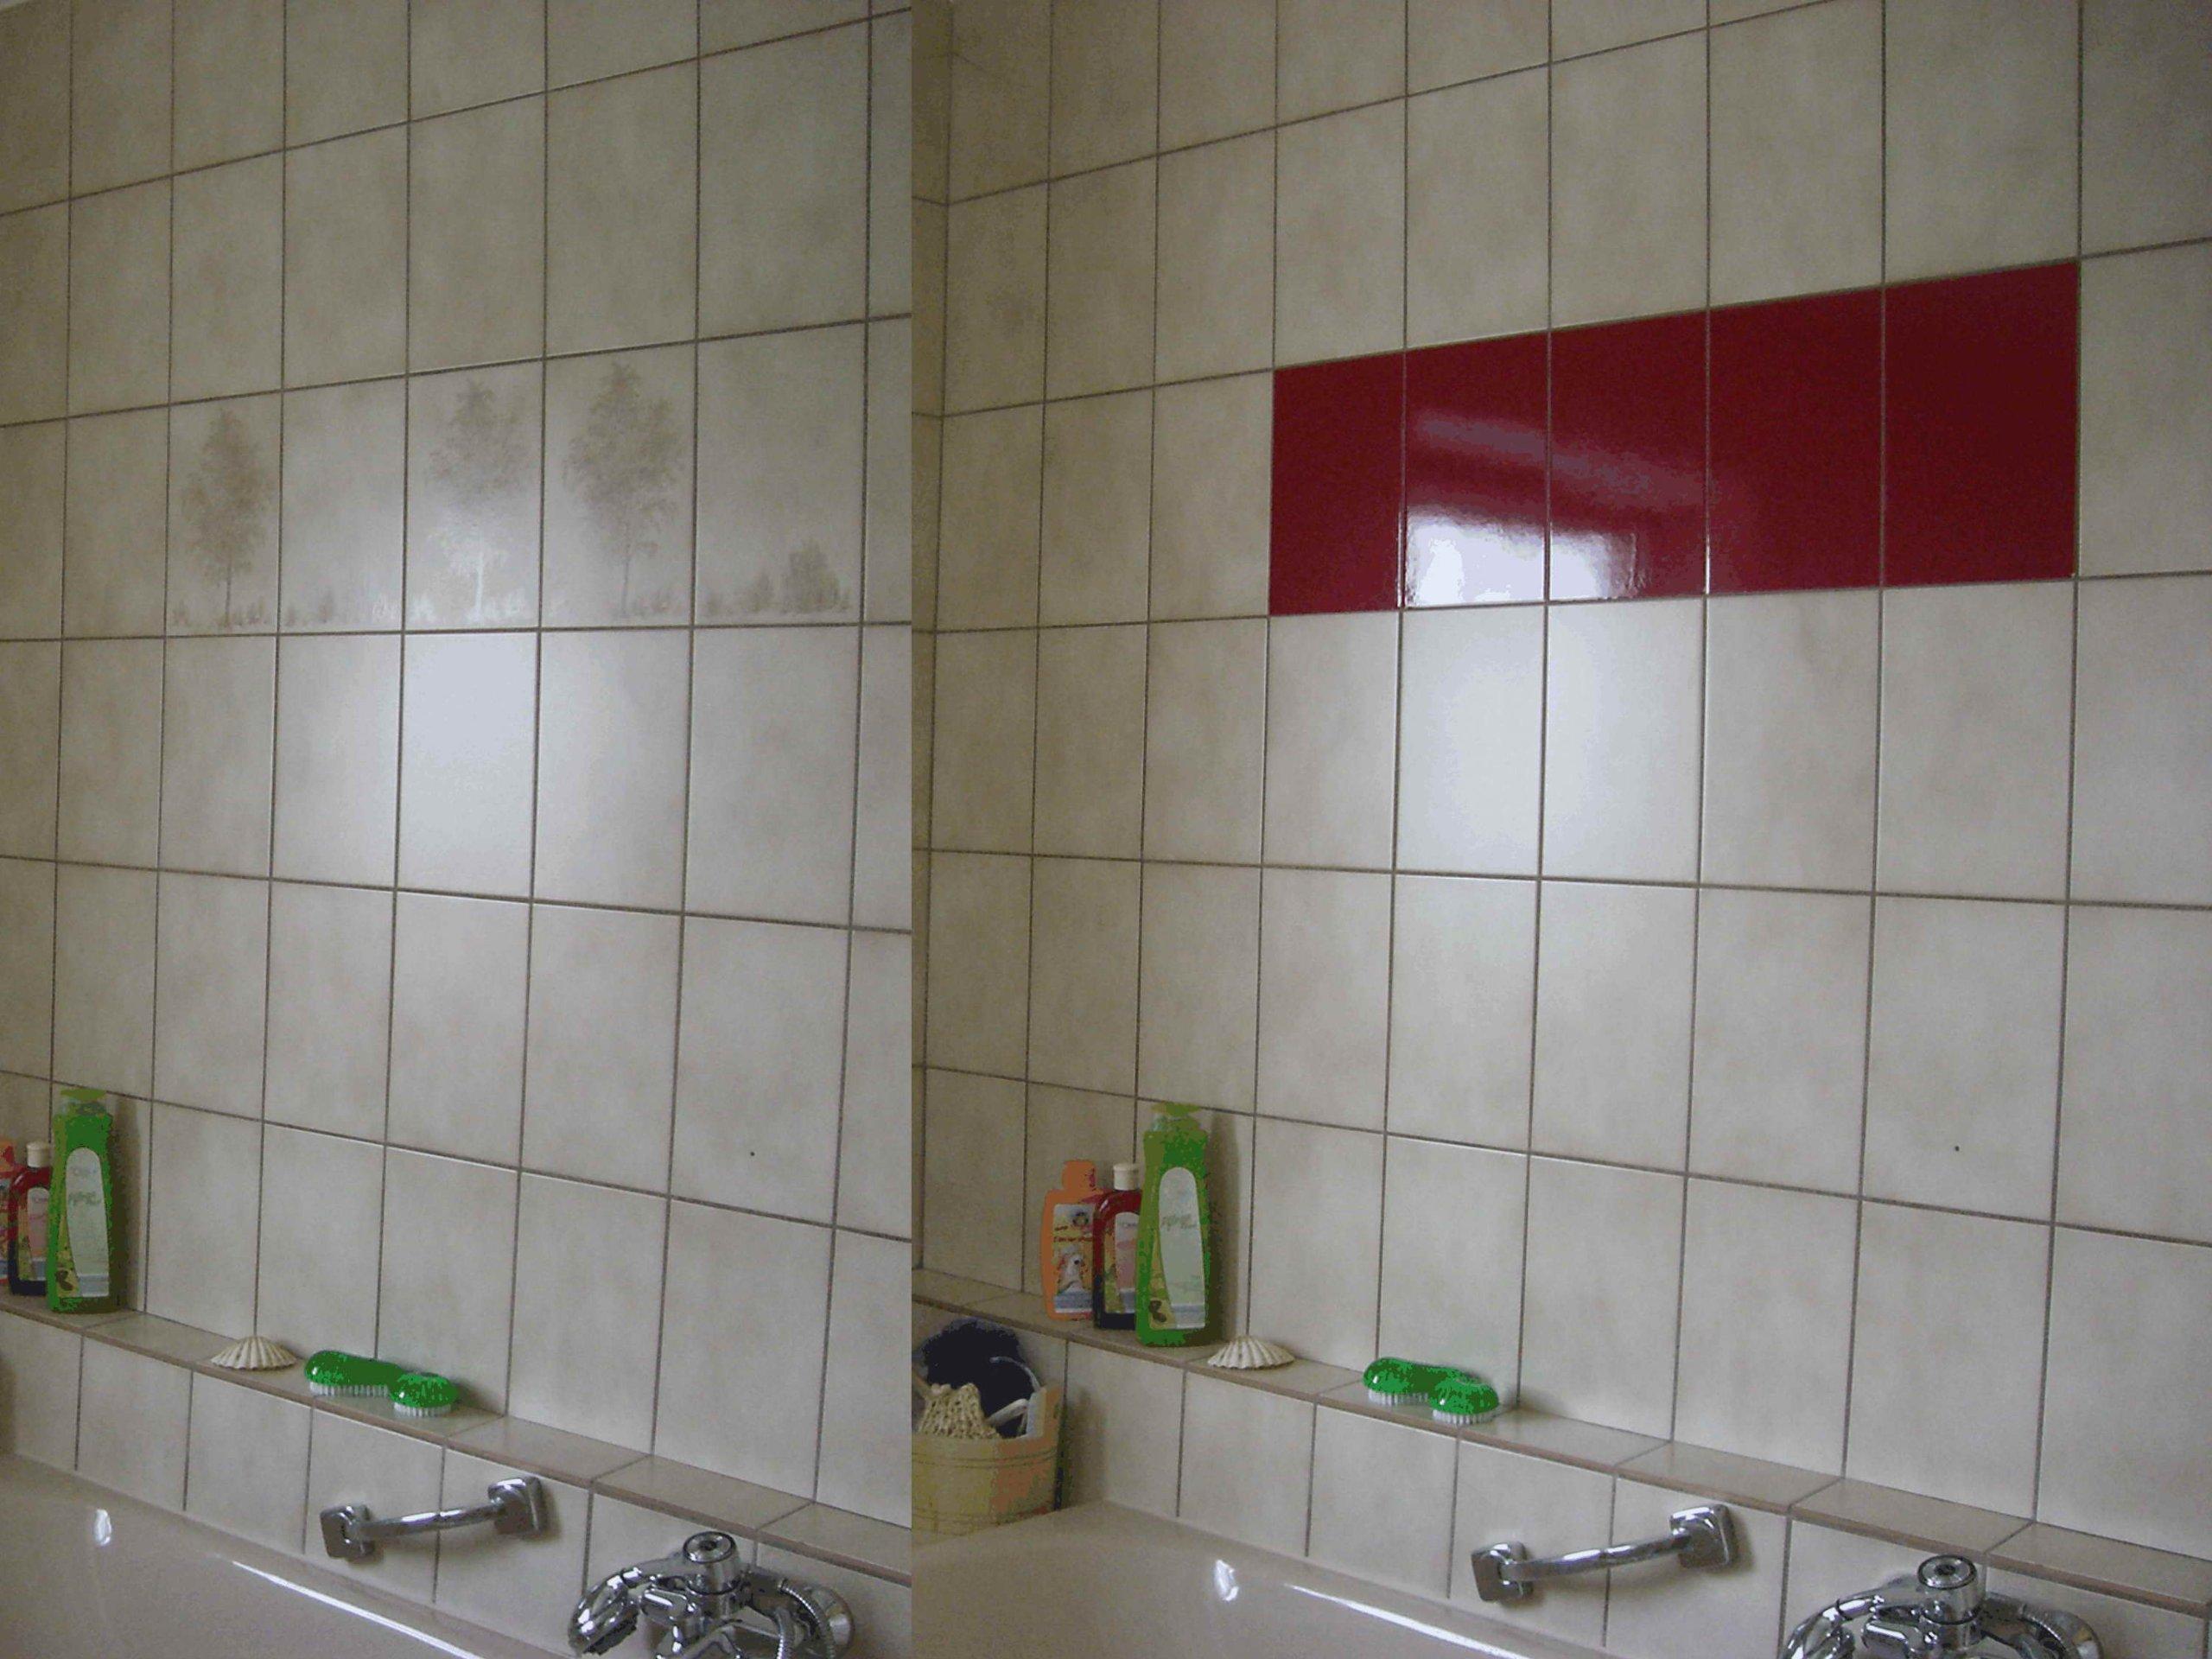 FoLIESEN Adesivi per piastrelle, per cucina e bagno, 15 x 15 cm ...